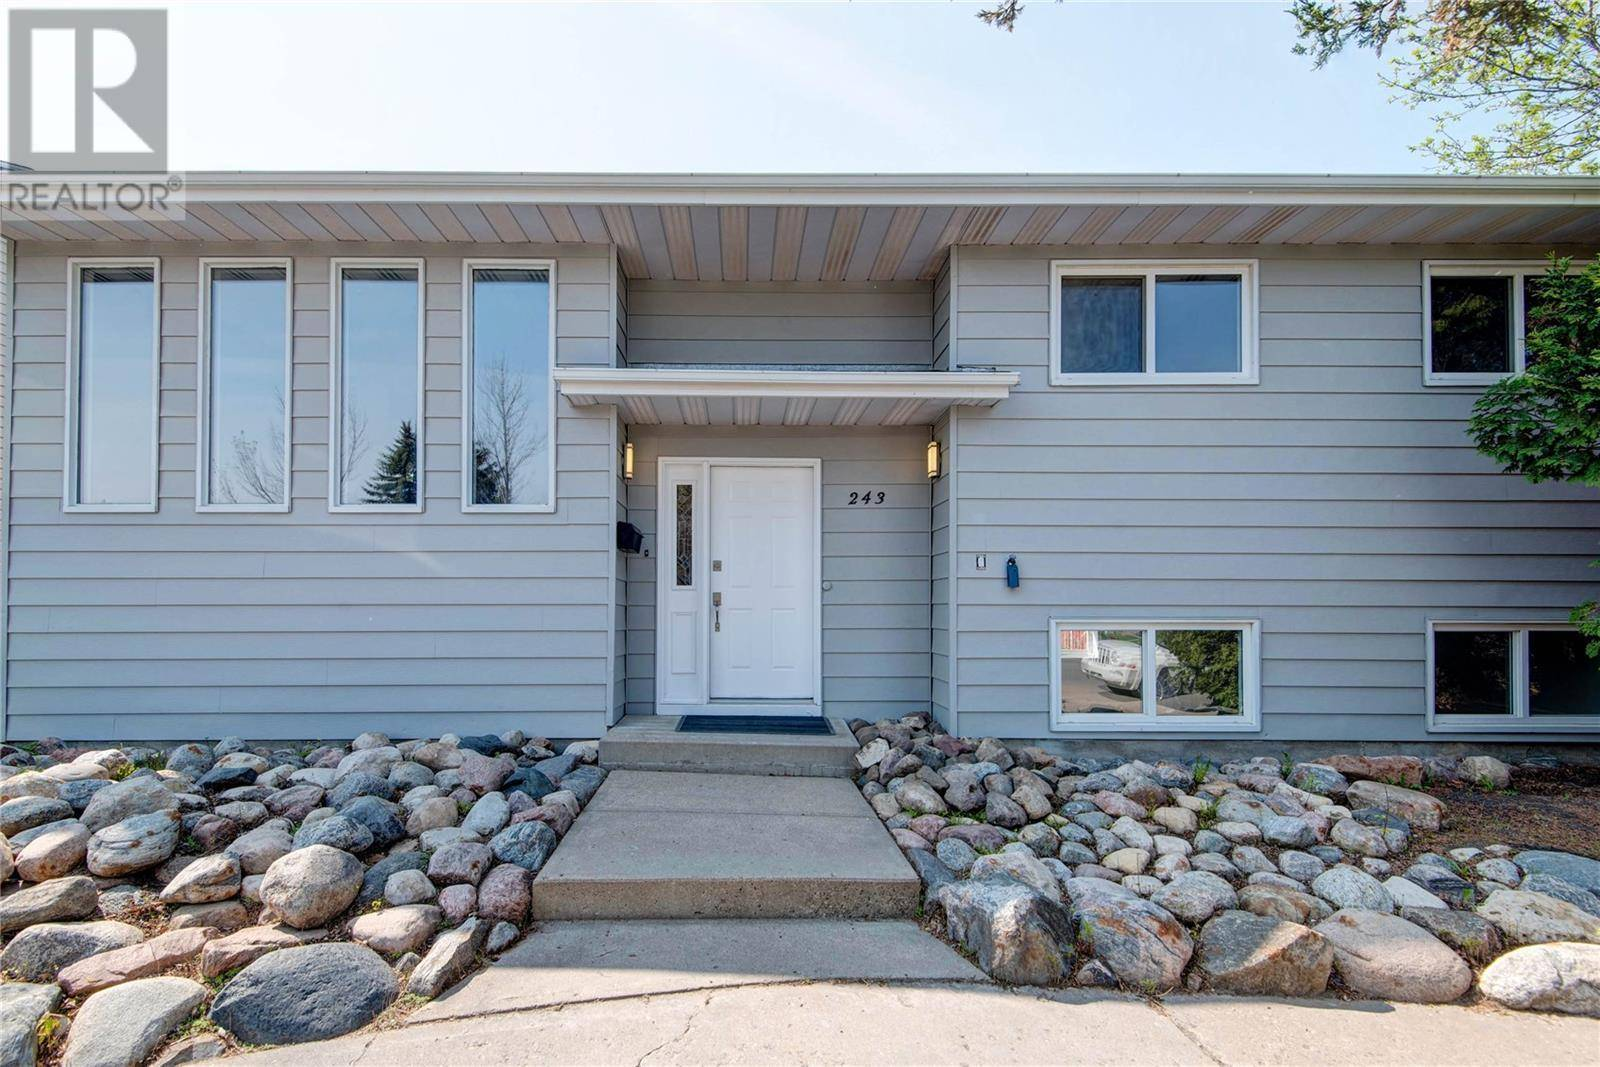 House for sale at 243 Meilicke Rd Saskatoon Saskatchewan - MLS: SK784295